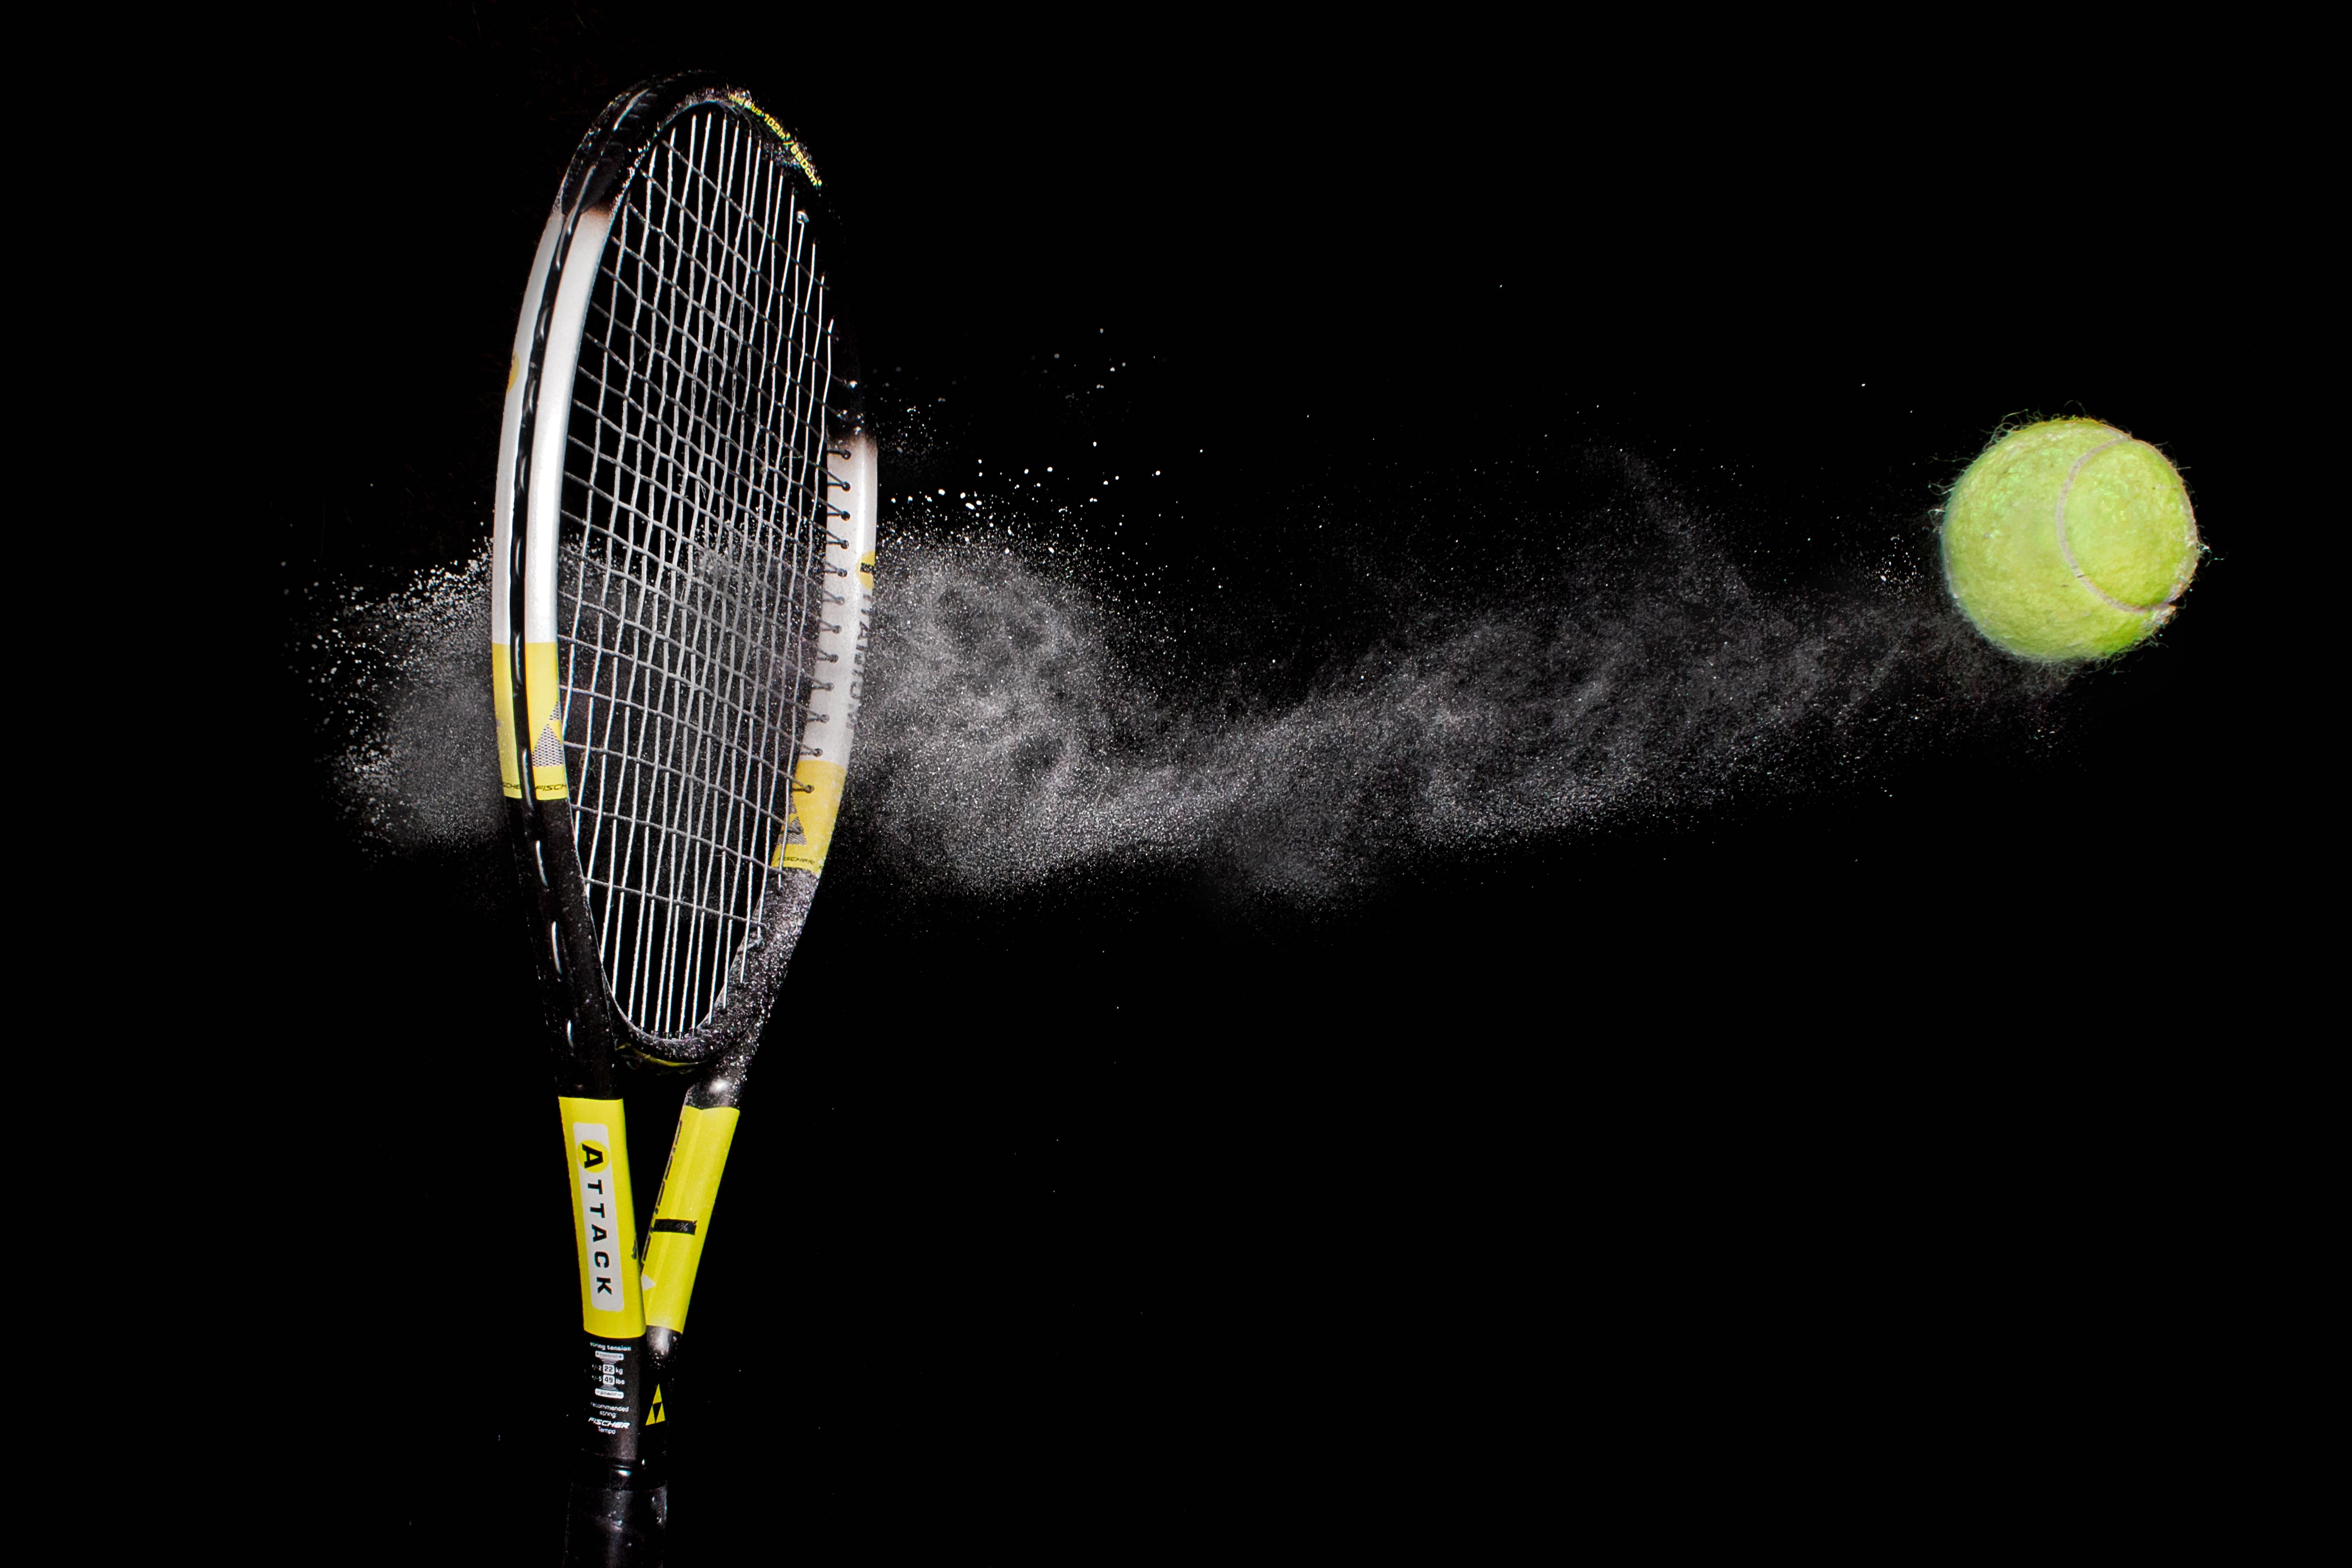 Image: Racket, tennis, ball, strike, black background